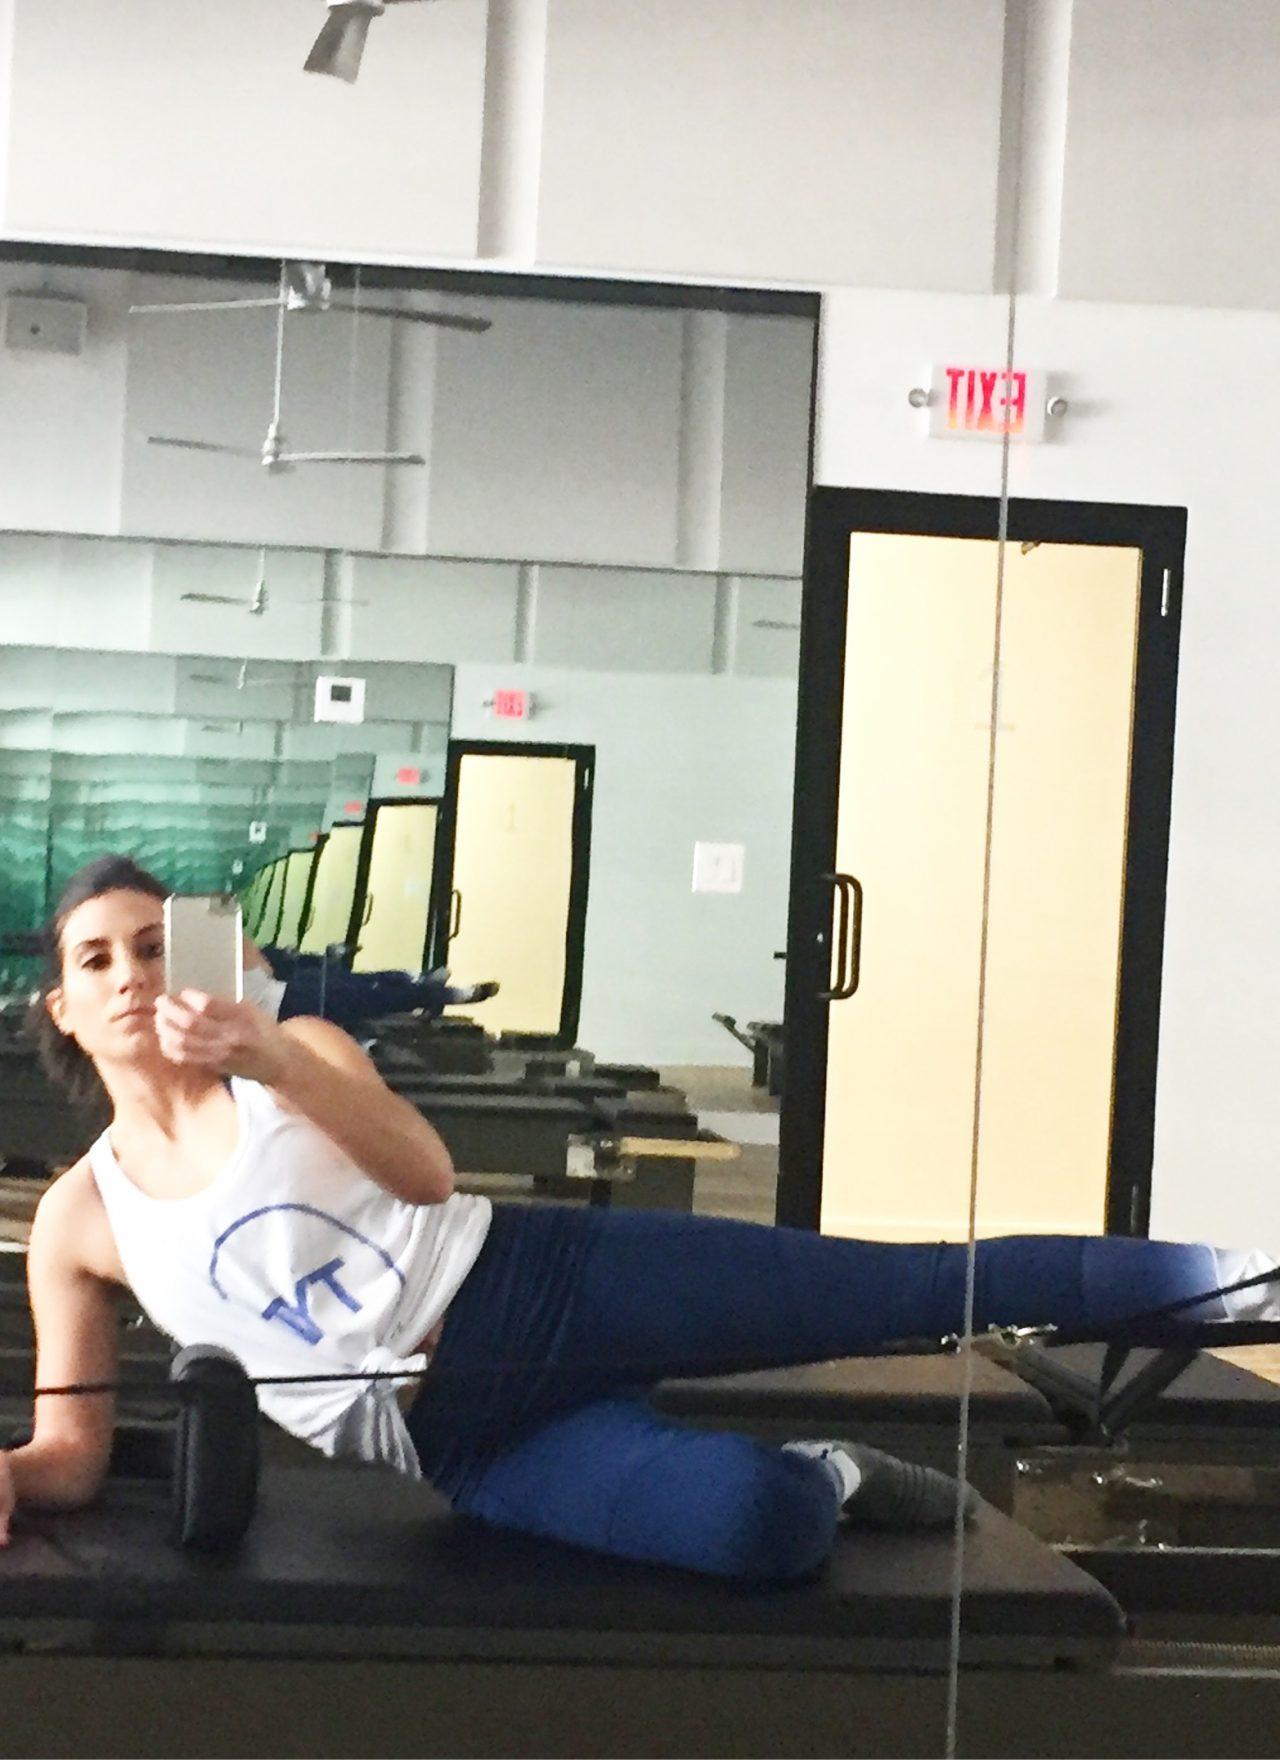 My First Pilates Class with FLEX Studios